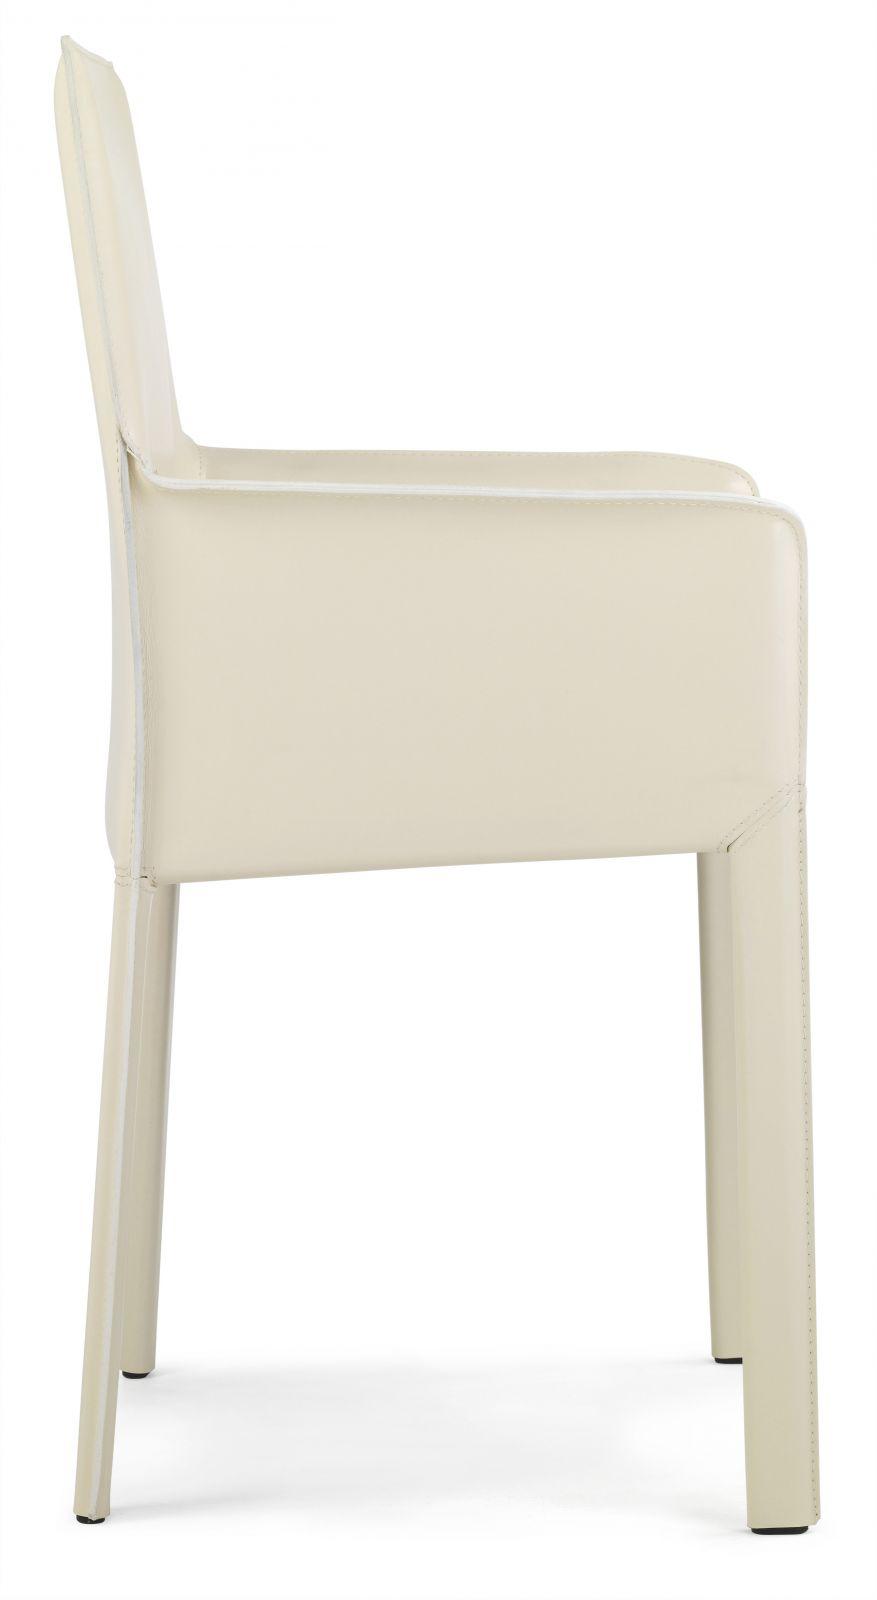 modern-office-armchairs-Italian-furniture-designer-armchairs (20).jpg